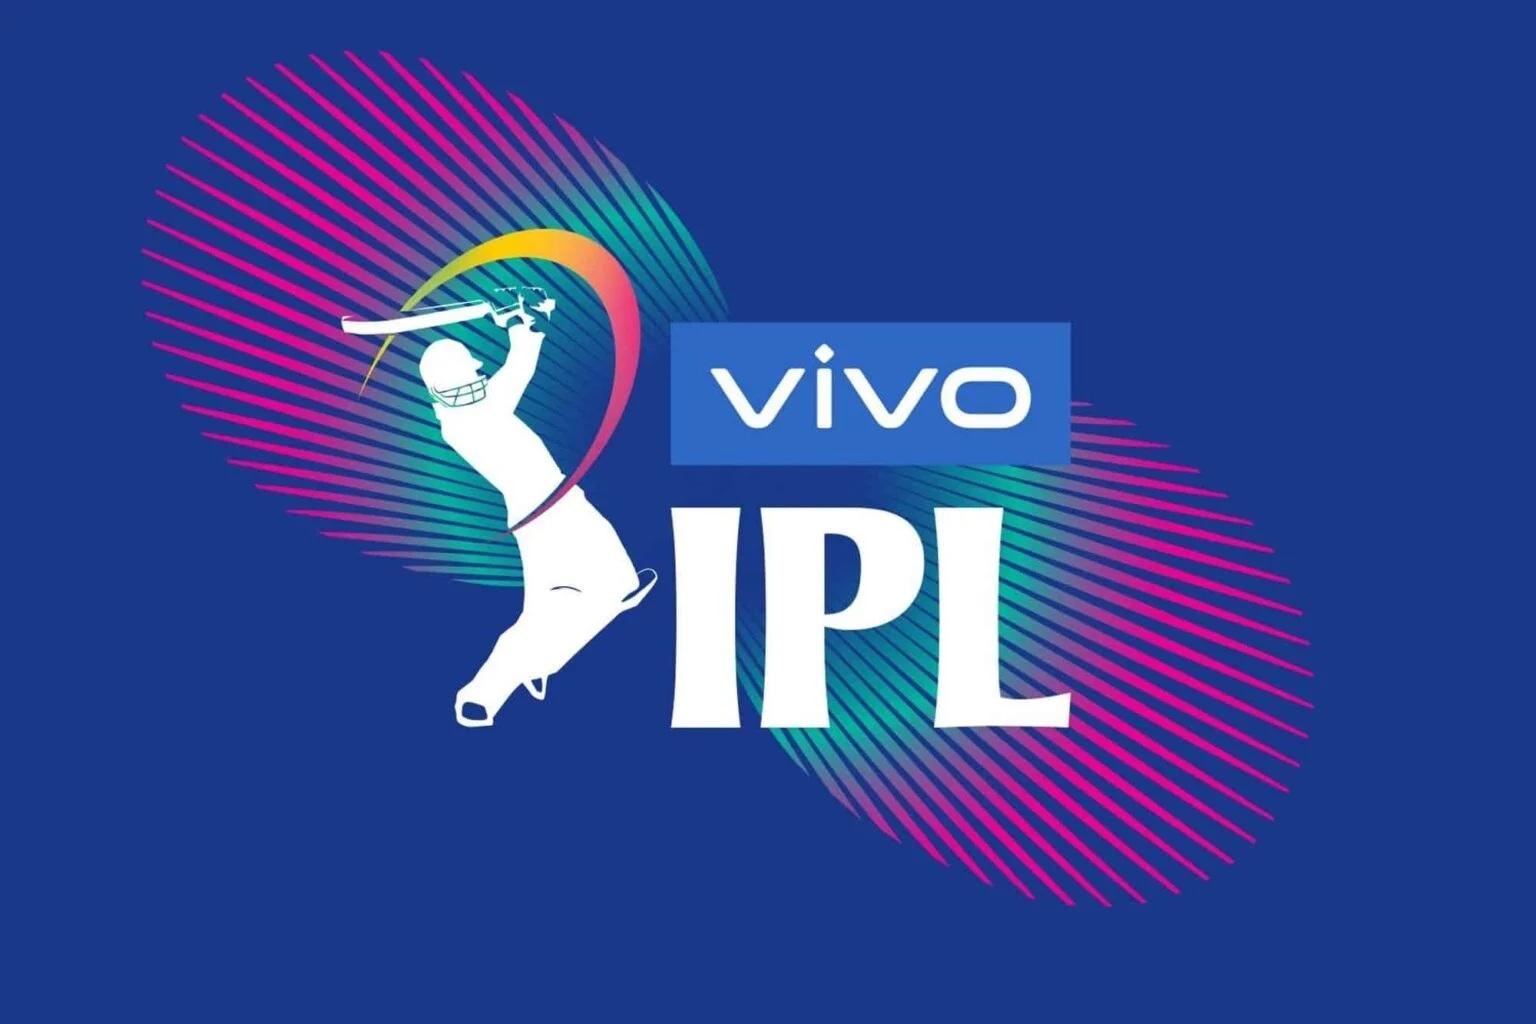 IPL2021: ভিভো করল আইপিএলের টাইটেল স্পনসর হতে অস্বীকার, এই ভারতীয় কোম্পানি হতে পারে 1